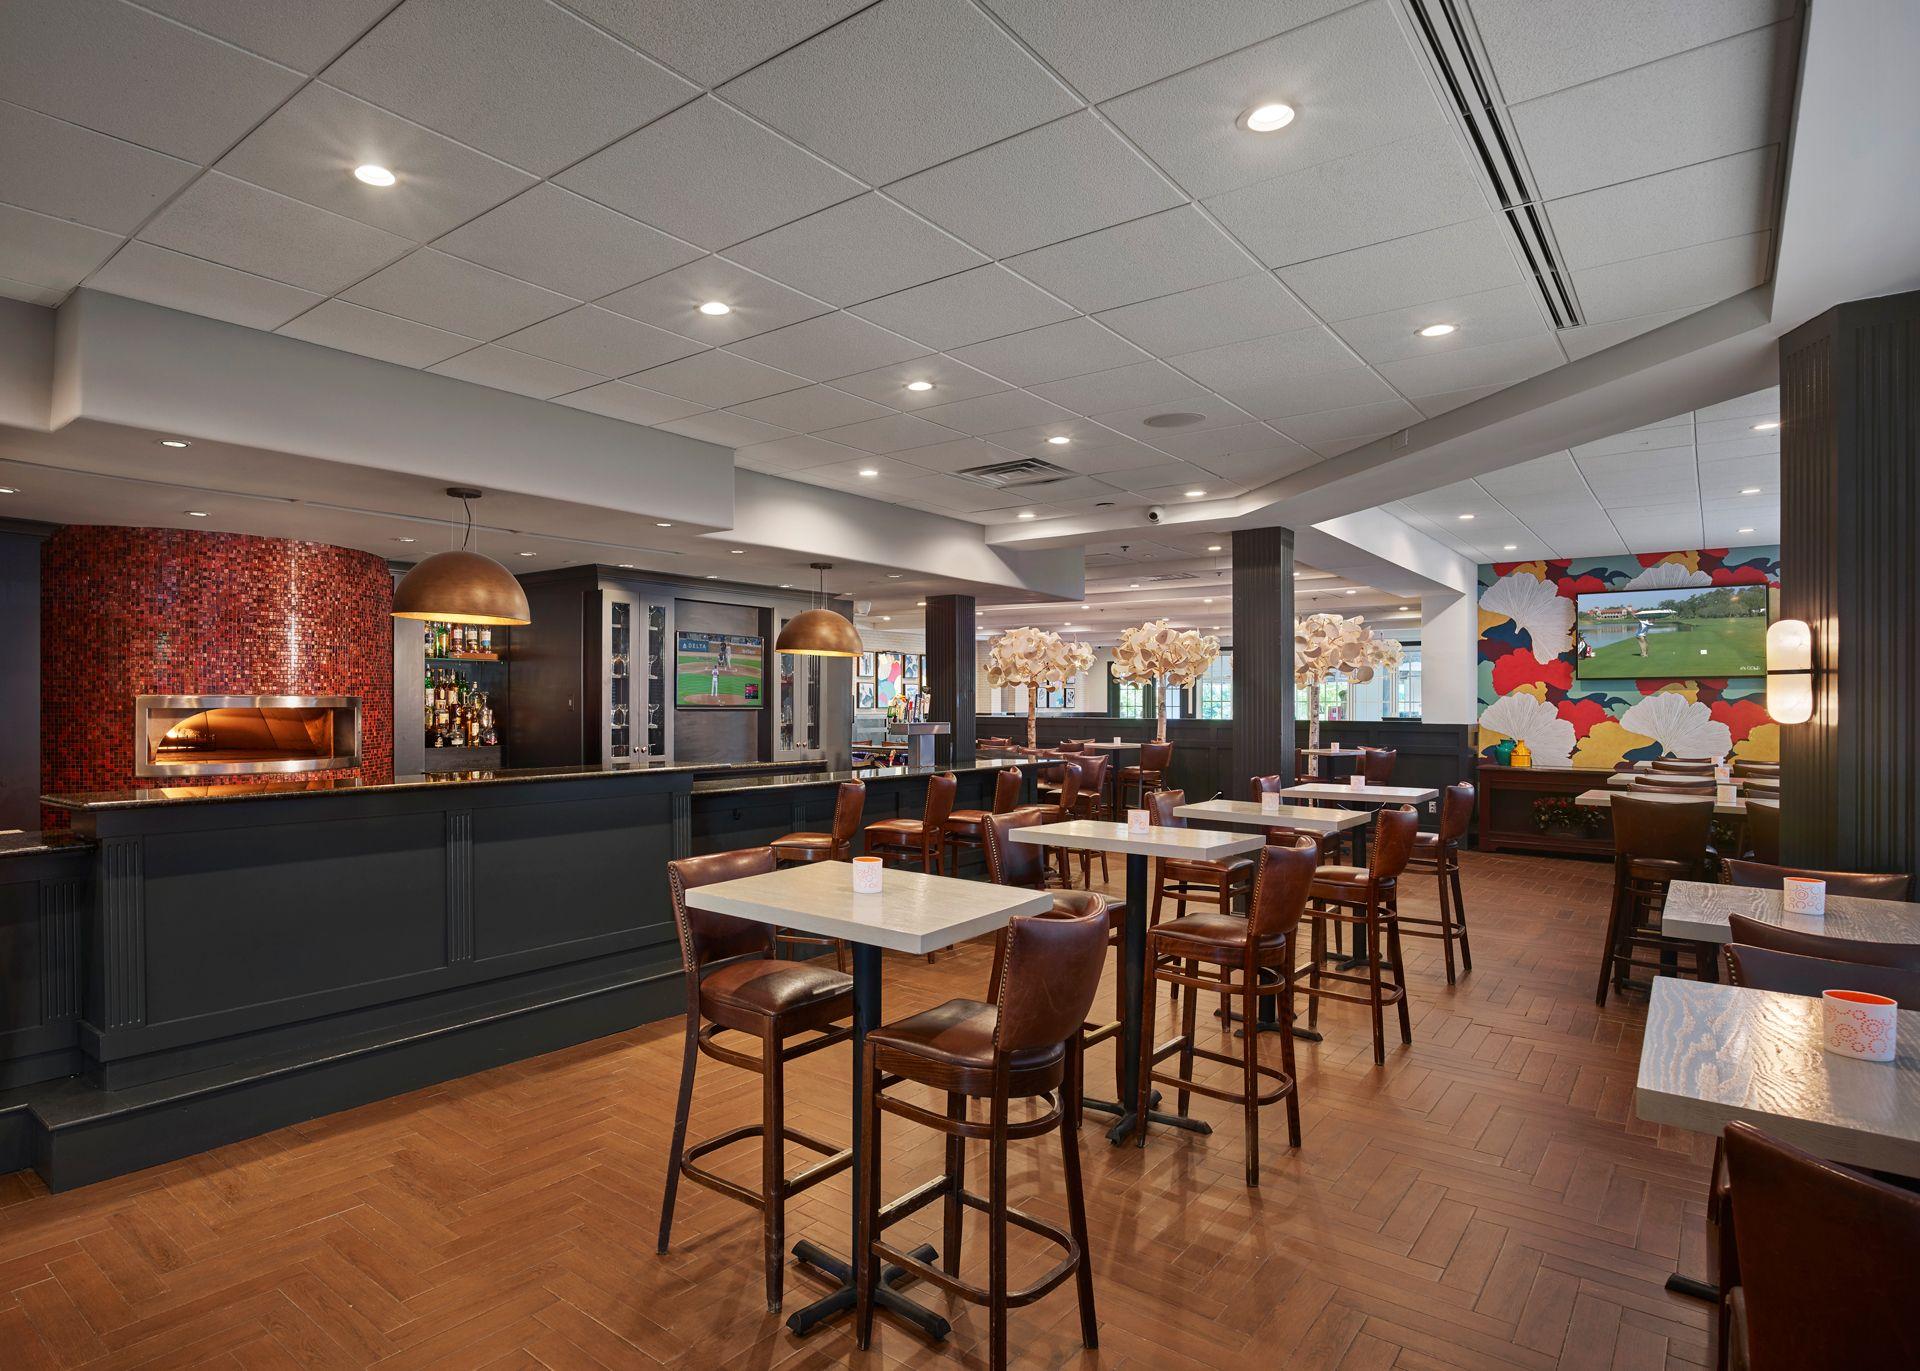 Tavola Restaurant Amp Bar Springfield Country Club On Site